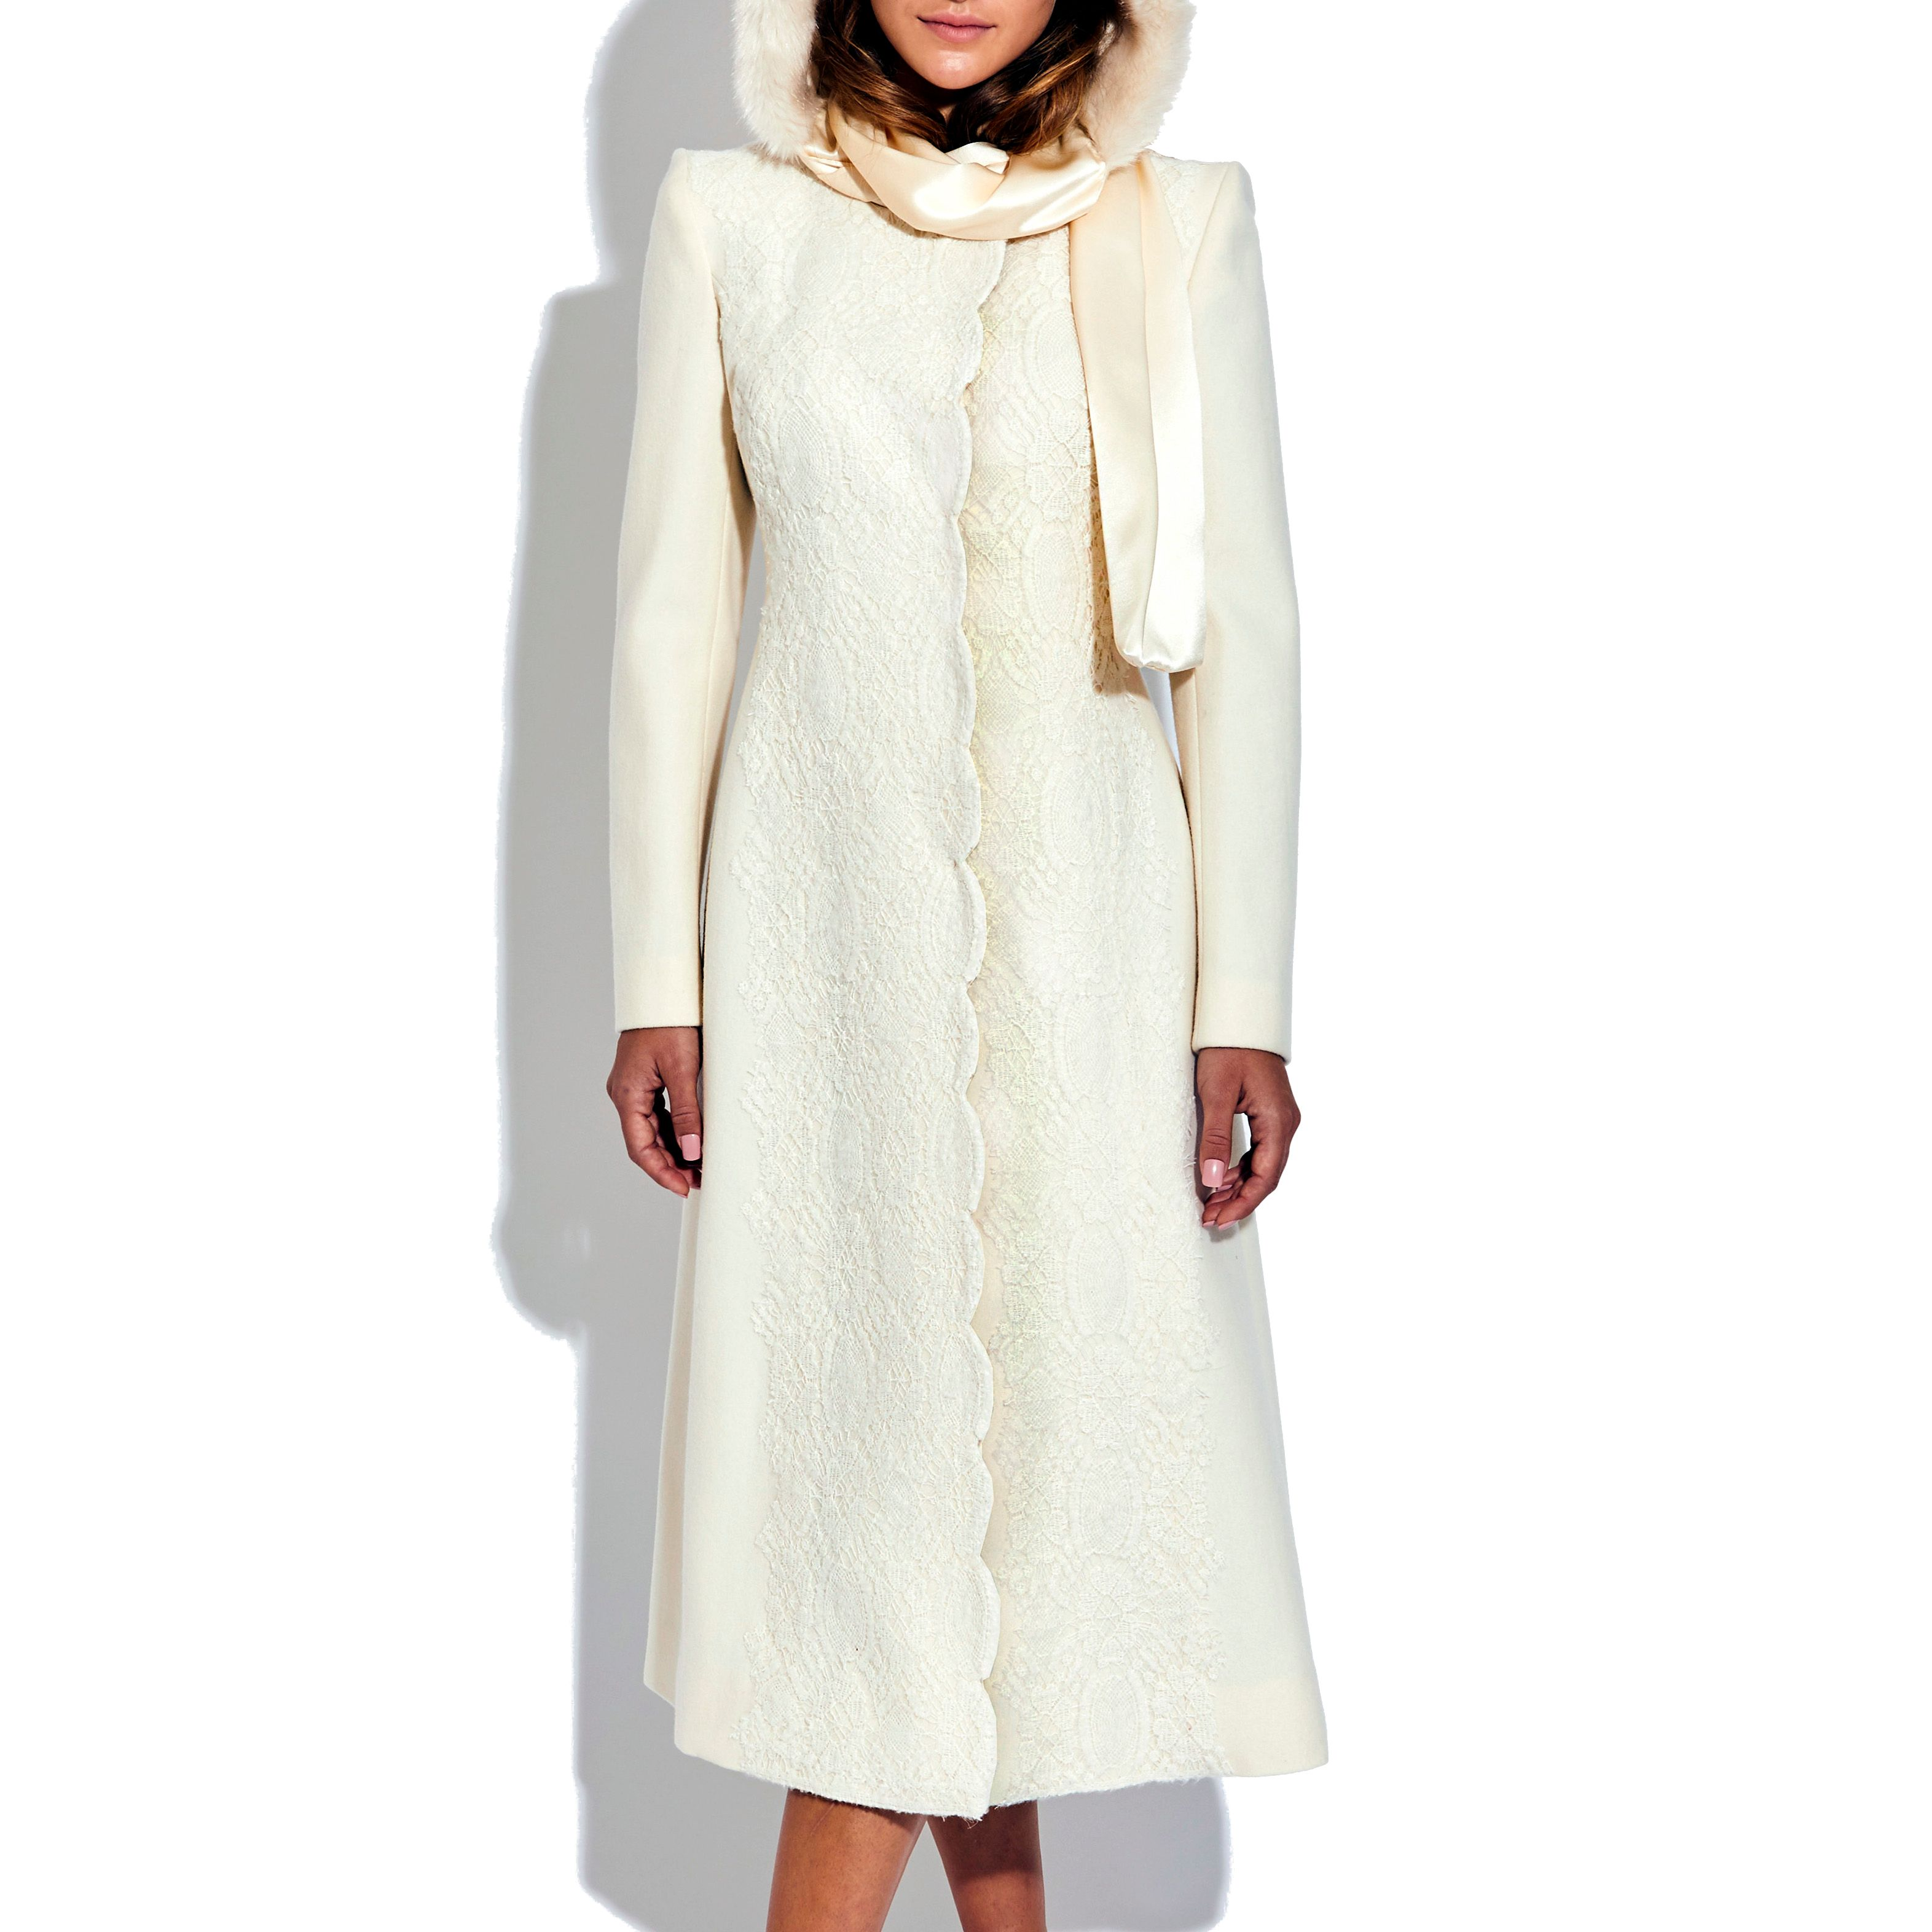 Catherine Walker Valeria Coat Dress In Winter White In 2021 Dresses Coat Dress Winter Dresses [ 3144 x 3144 Pixel ]